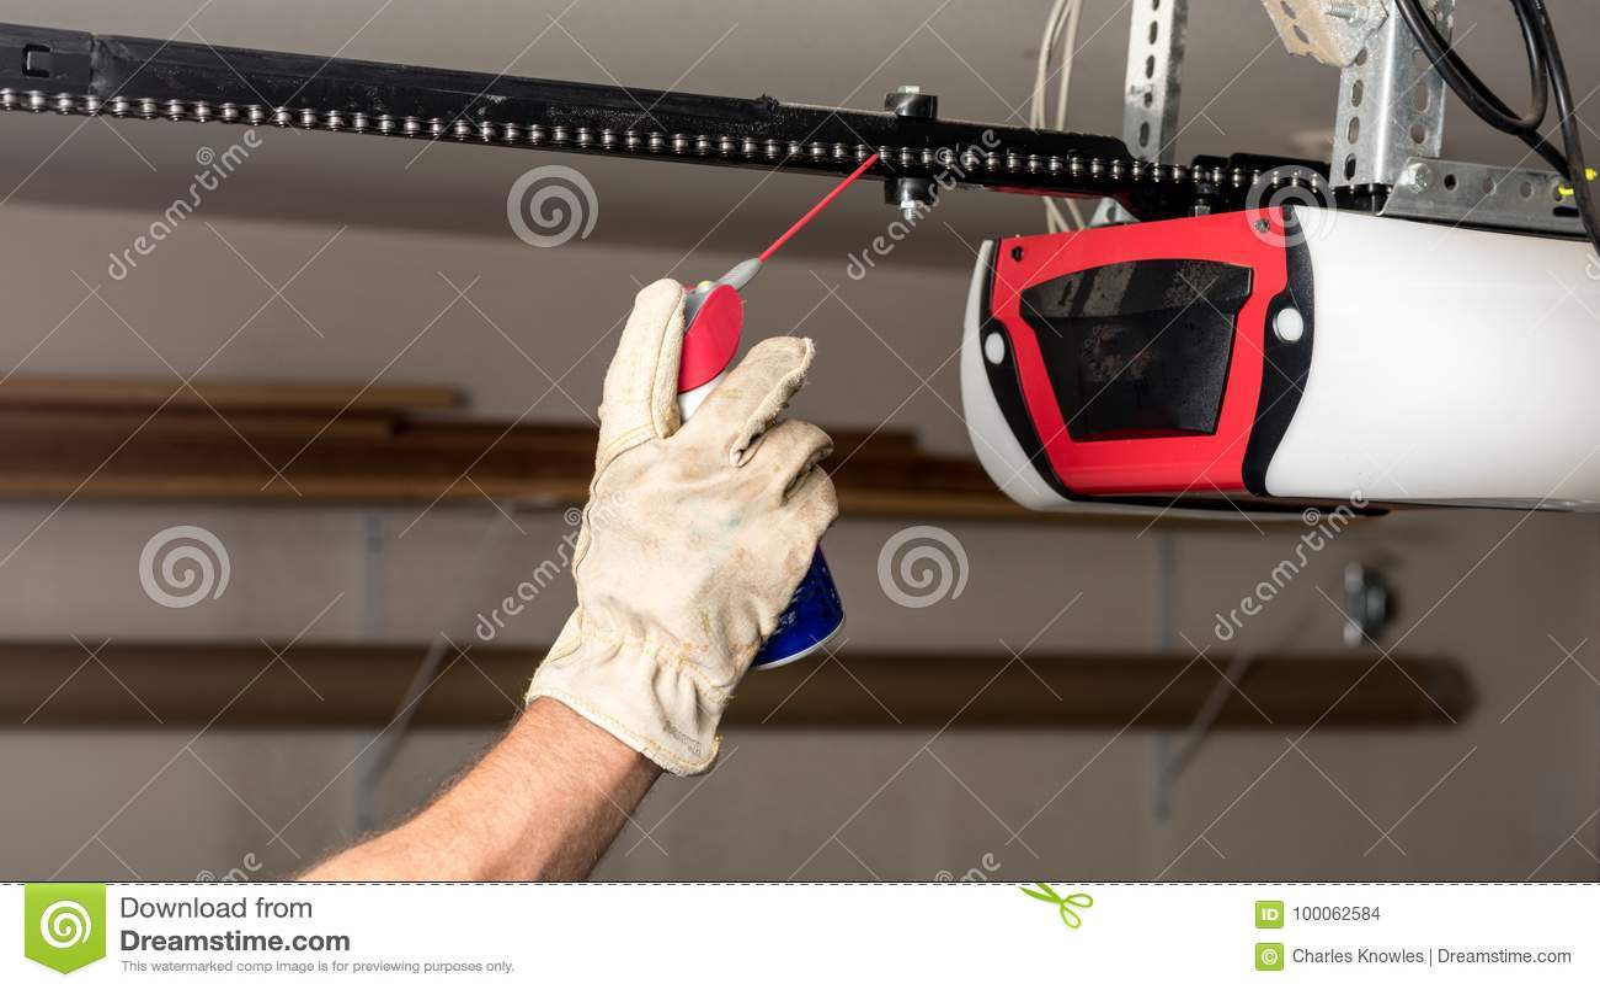 Applying Oil To A Chain Of A Garage Door Opener Stock Photo Image